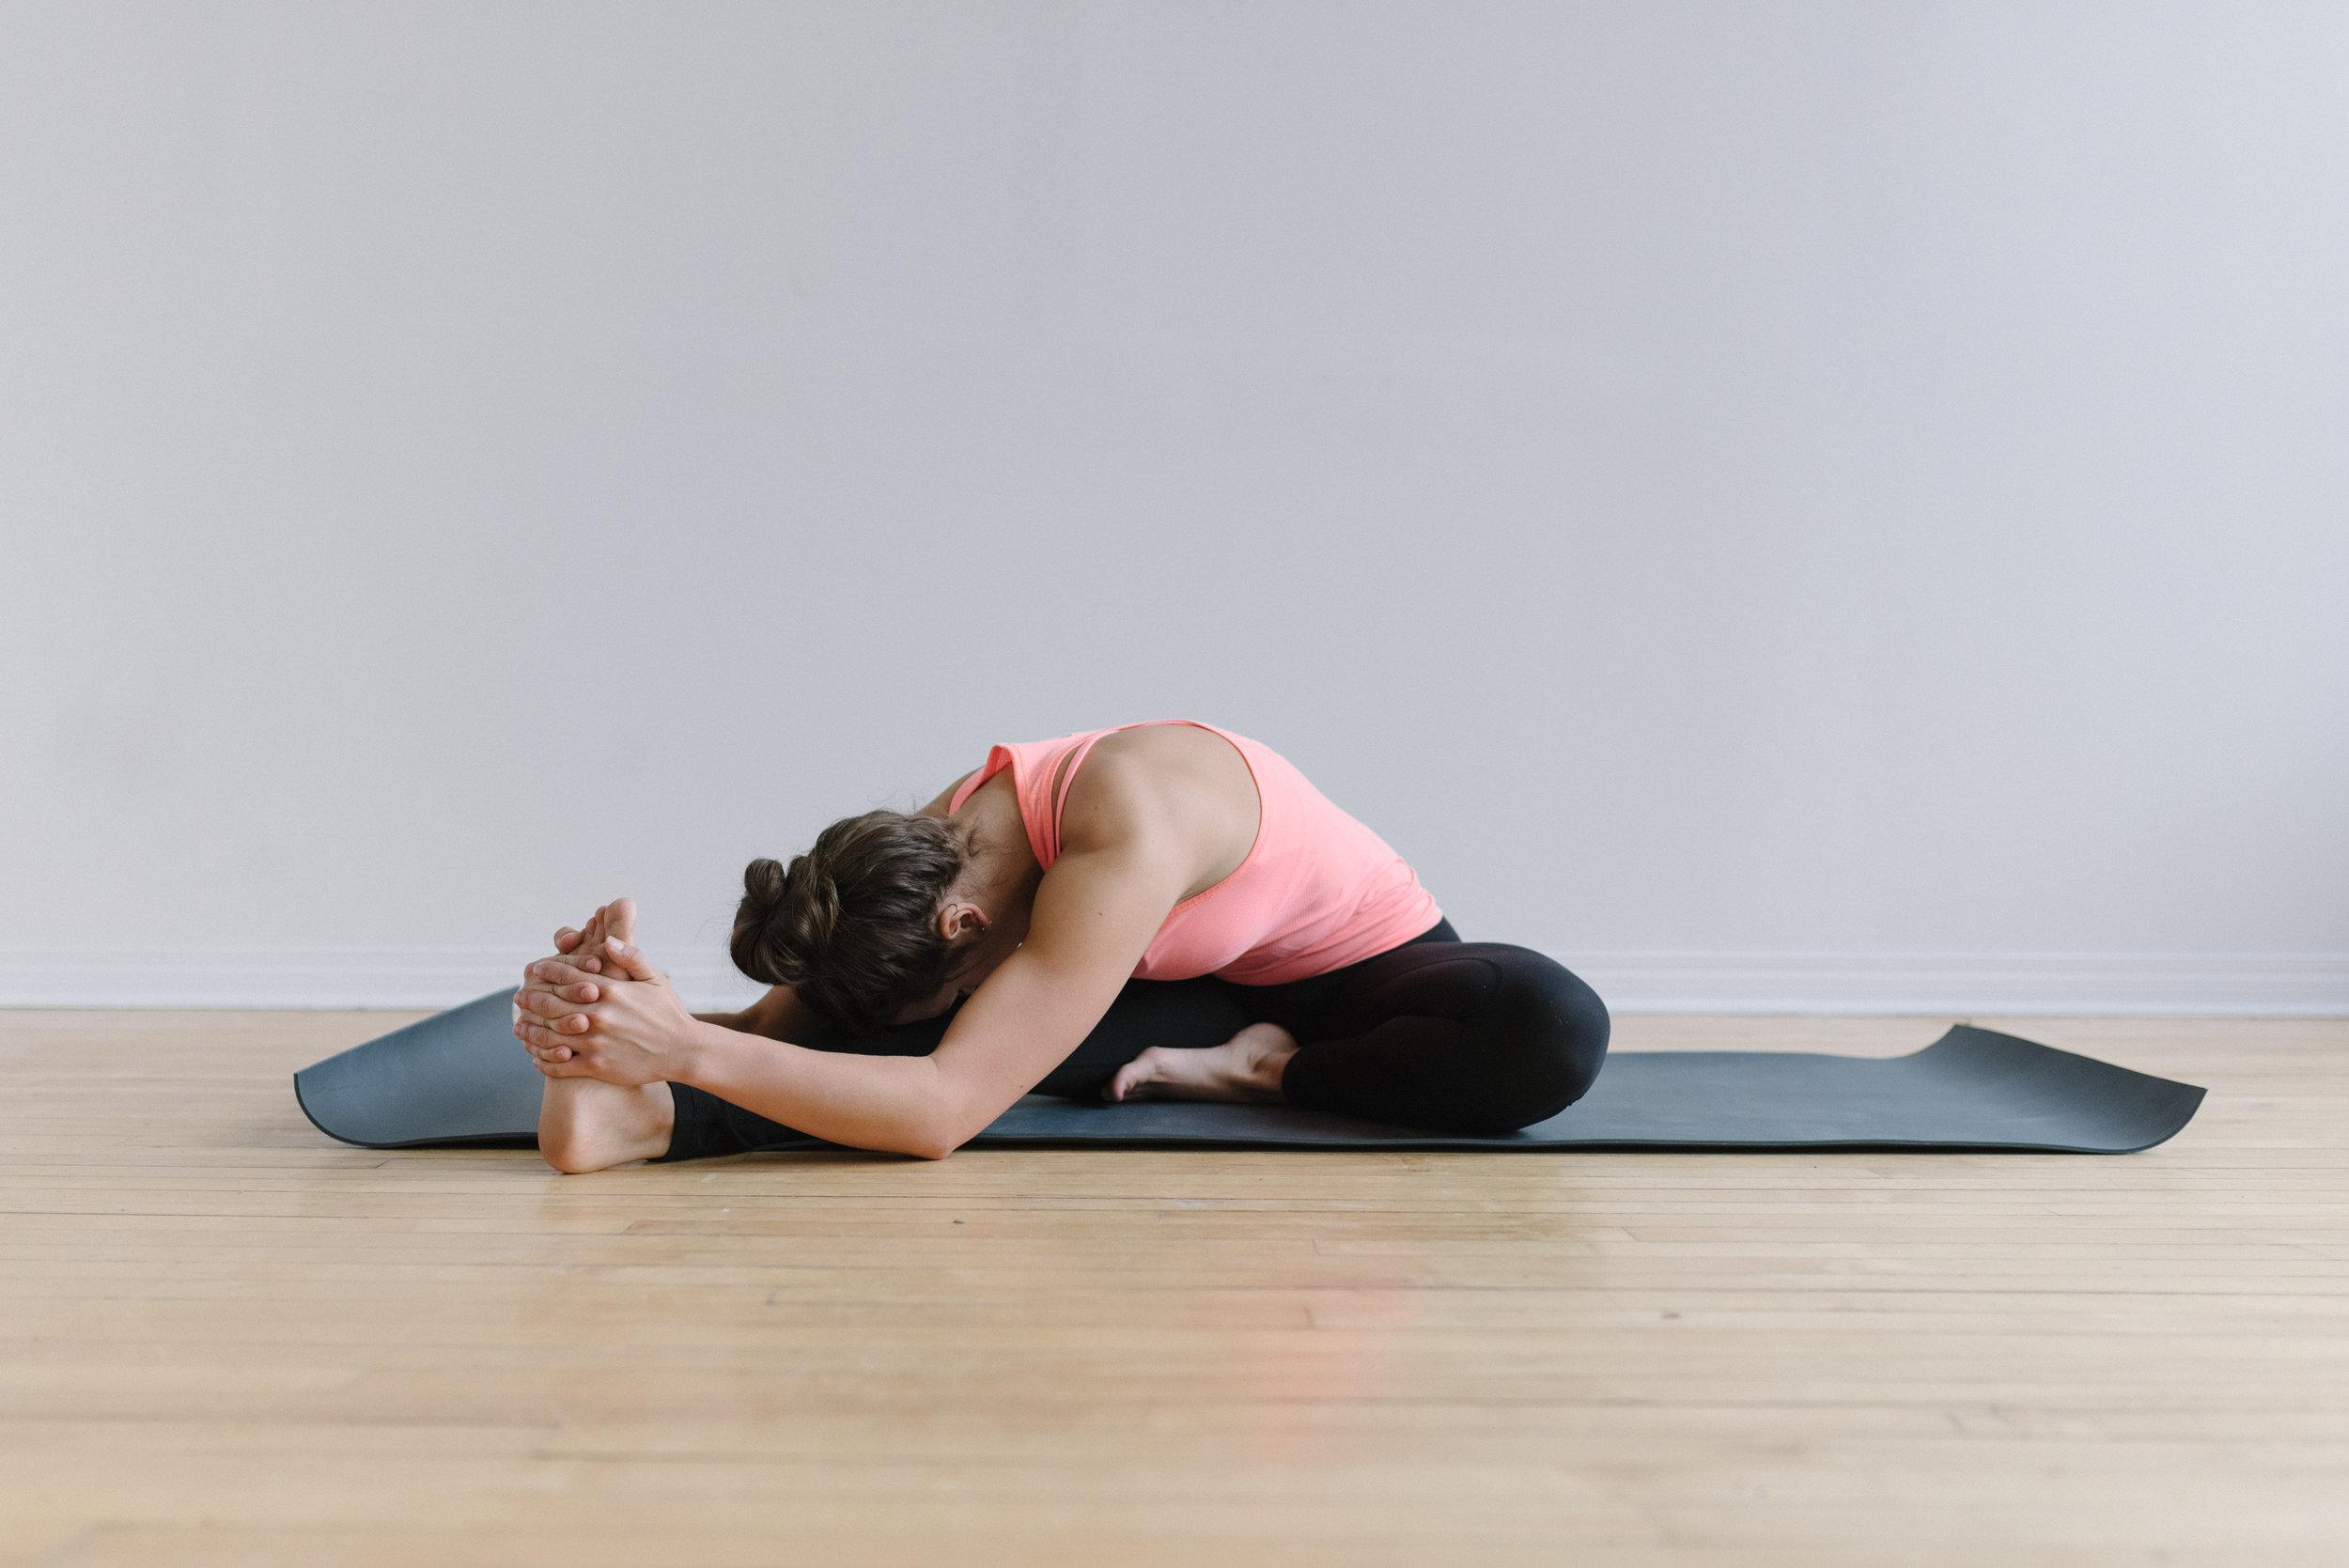 Sam+D+Squire+_+Yoga+_+Meditation+_+Splits+_+Yoga+Pose+_+Yoga+Sequence+_+At-Home+Yoga (5).jpeg